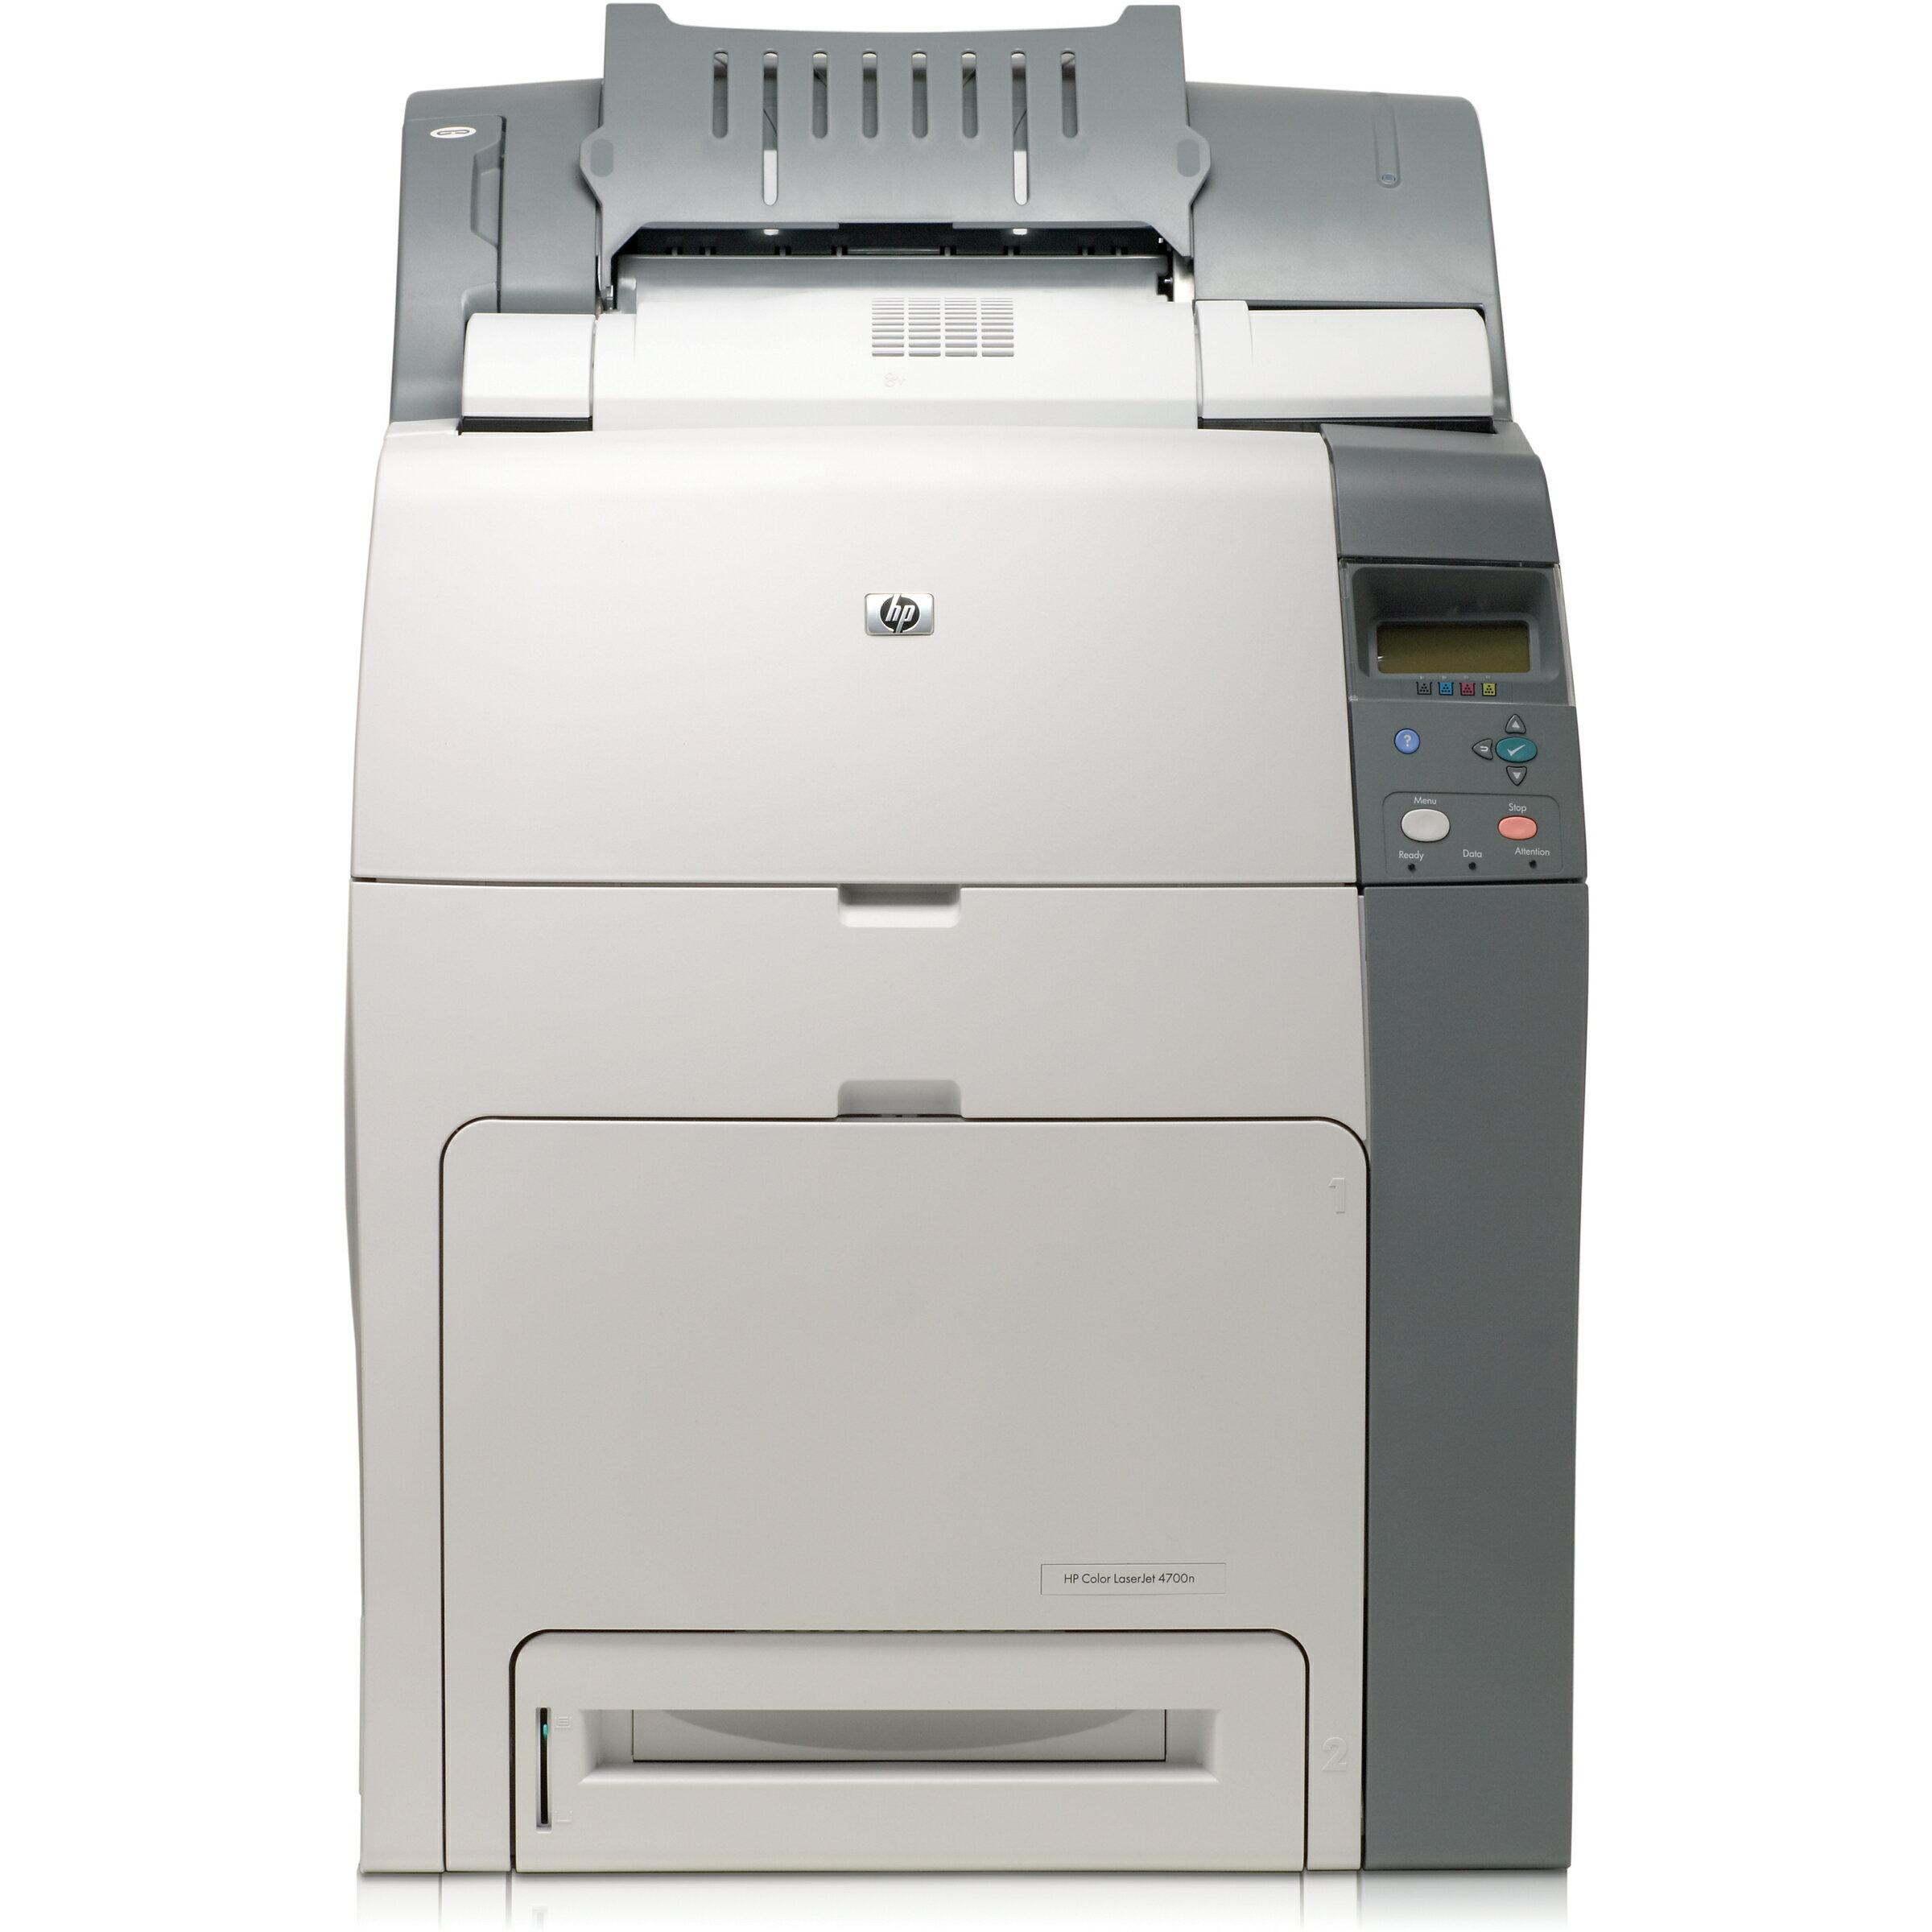 HP LaserJet 4700DN Laser Printer - Refurbished - Color - 600 x 600 dpi Print - Plain Paper Print - Desktop - 30 ppm Mono / 30 ppm Color Print - A4, A5, B5, DL Envelope, C5 Envelope, B5 Envelope, Custom Size - 200 sheets Standard Input Capacity - 100000 Du 1